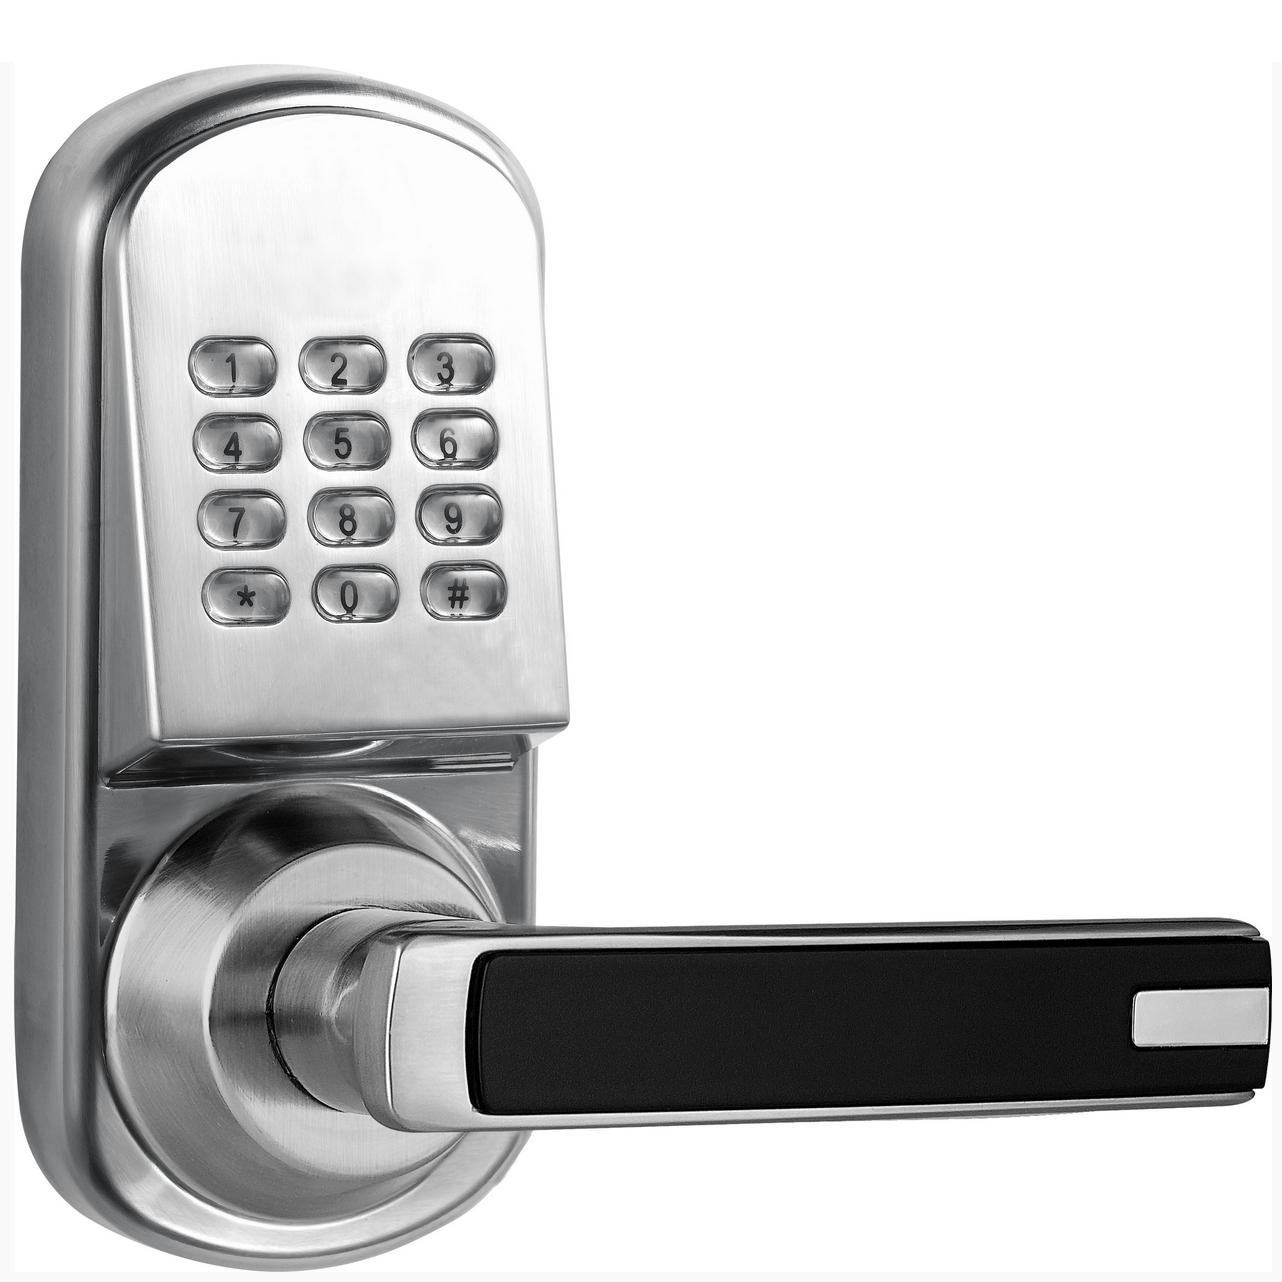 Wireless Z-Wave Door Lock - Illuminated Keypad